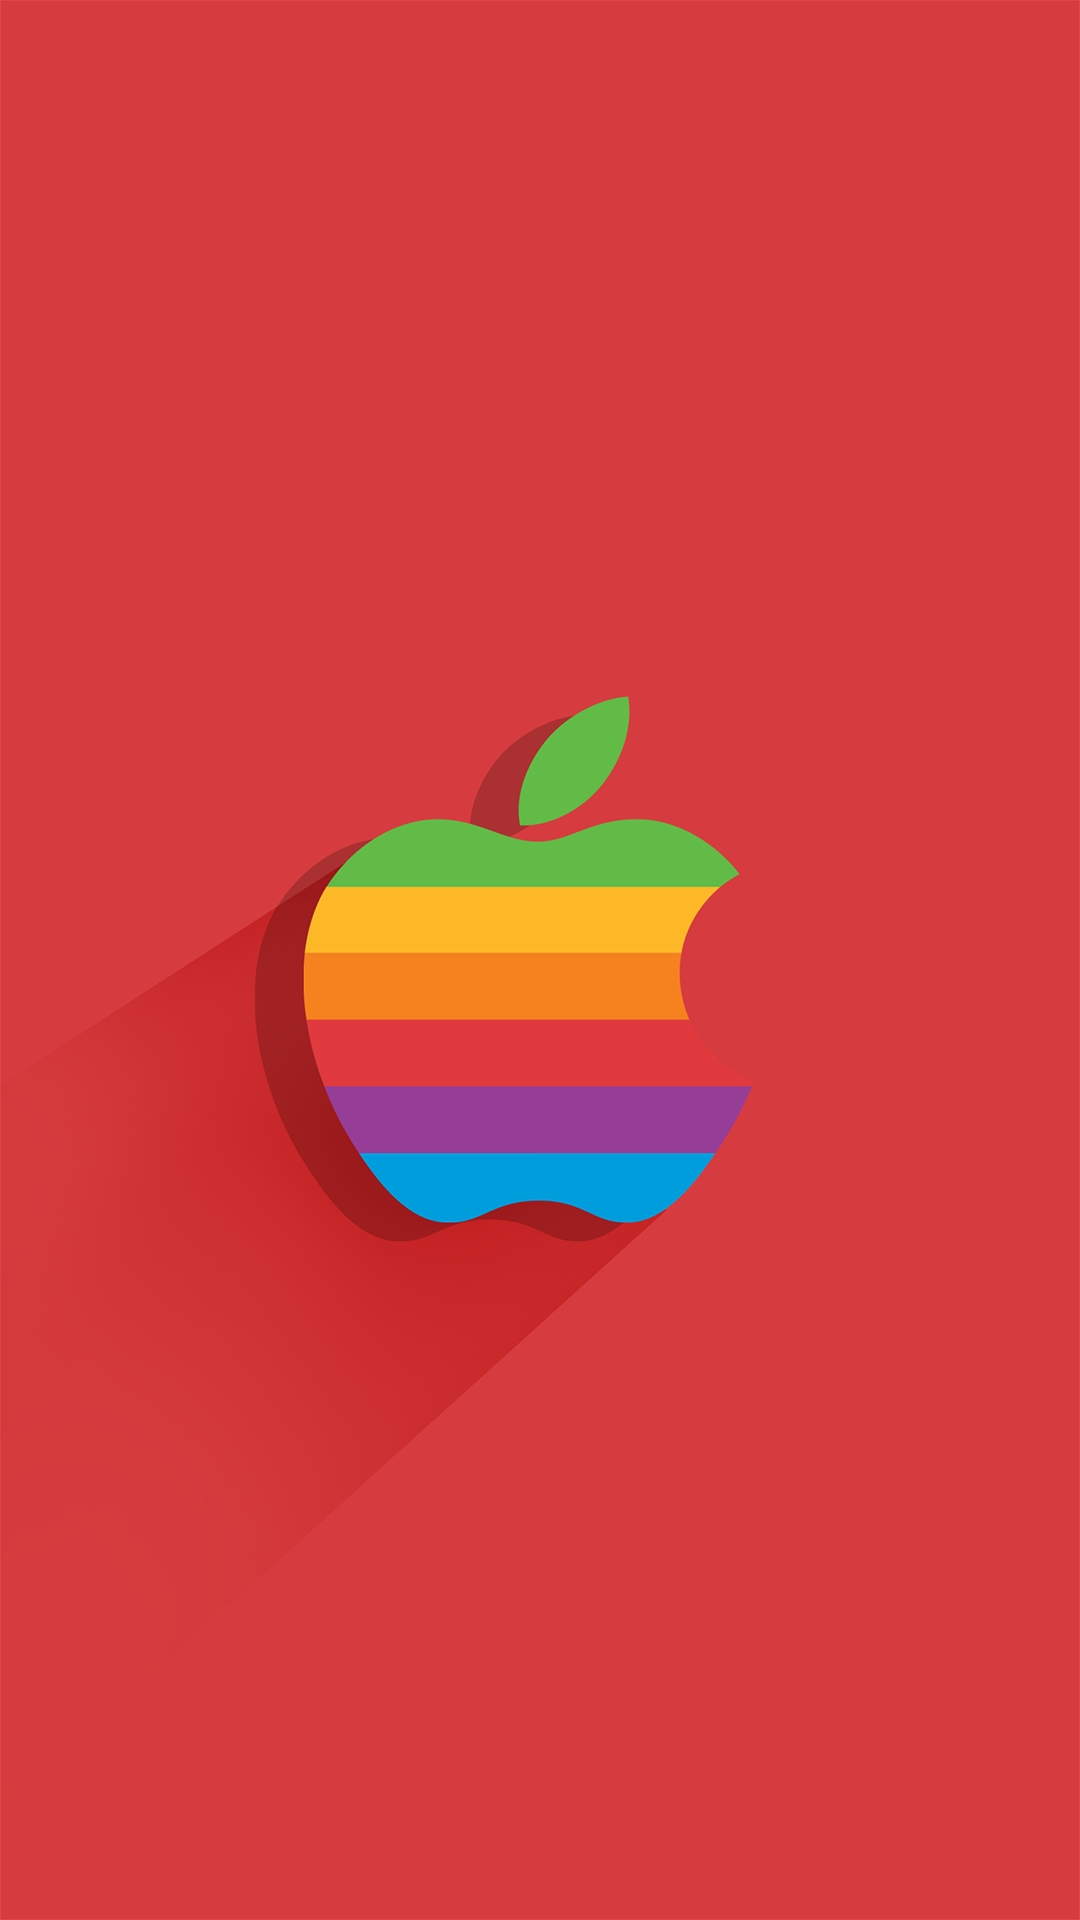 Wallpaper iphone apple logo -  Apple Logo Wallpaper Iphone 6s Plus By Lirking20